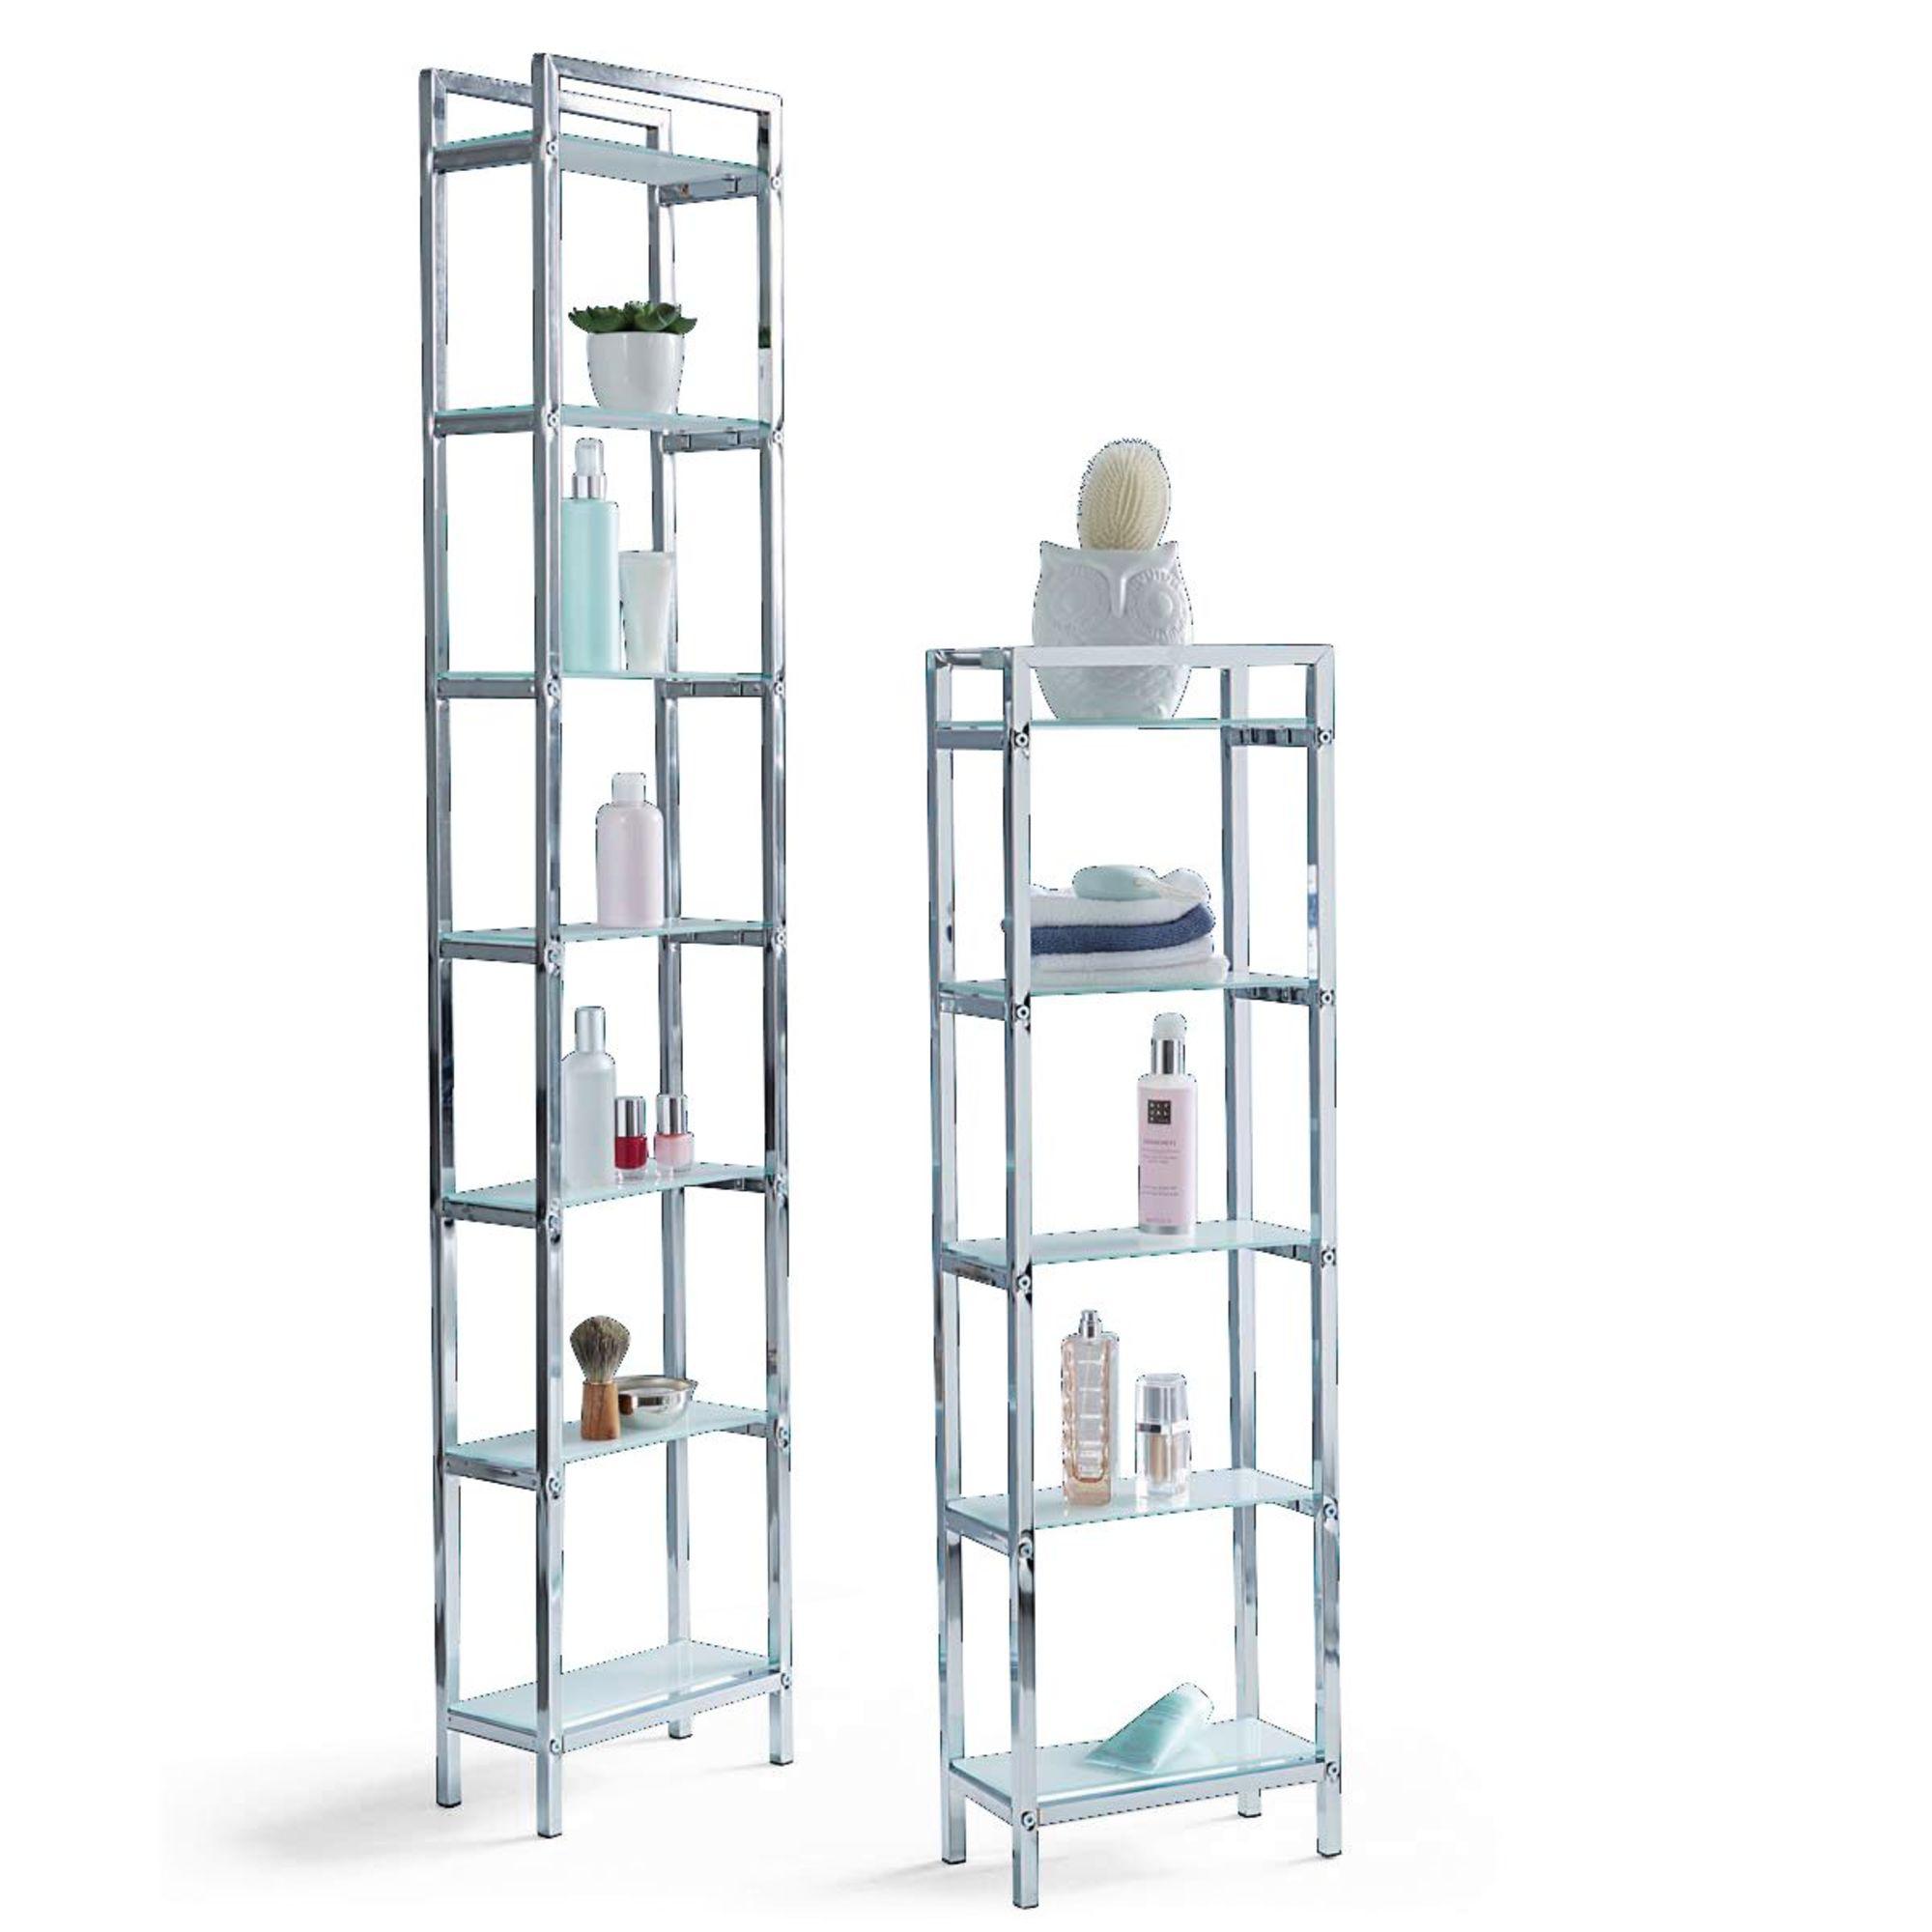 regal 15 cm tief wasa regalsystem with regal 15 cm tief. Black Bedroom Furniture Sets. Home Design Ideas